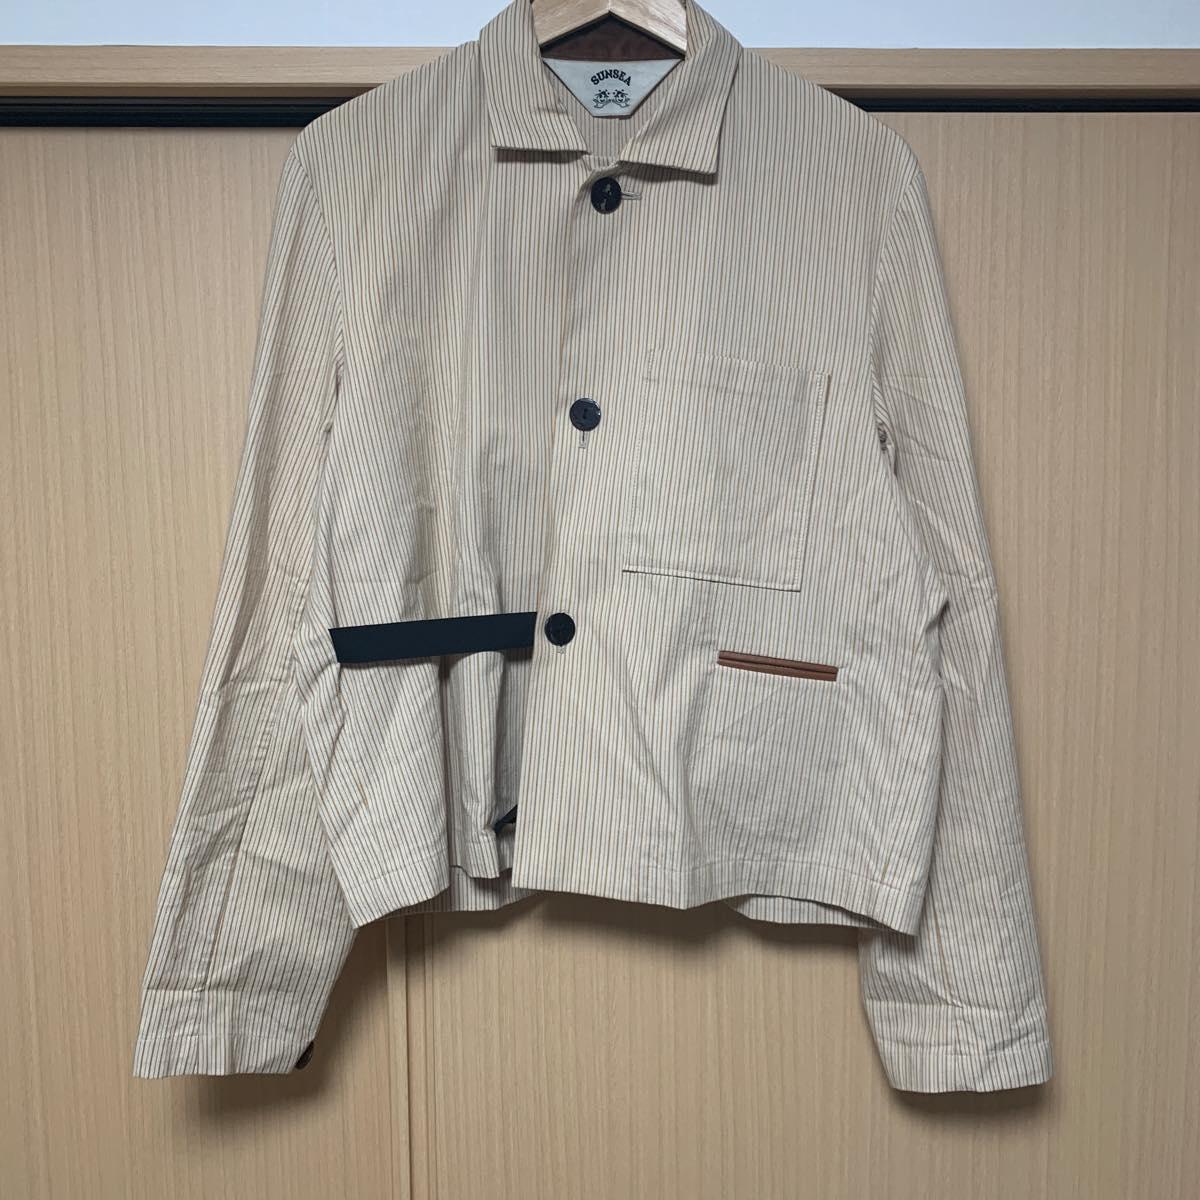 SUNSEA(サンシー) BUENA VISTA Stripe Jacket